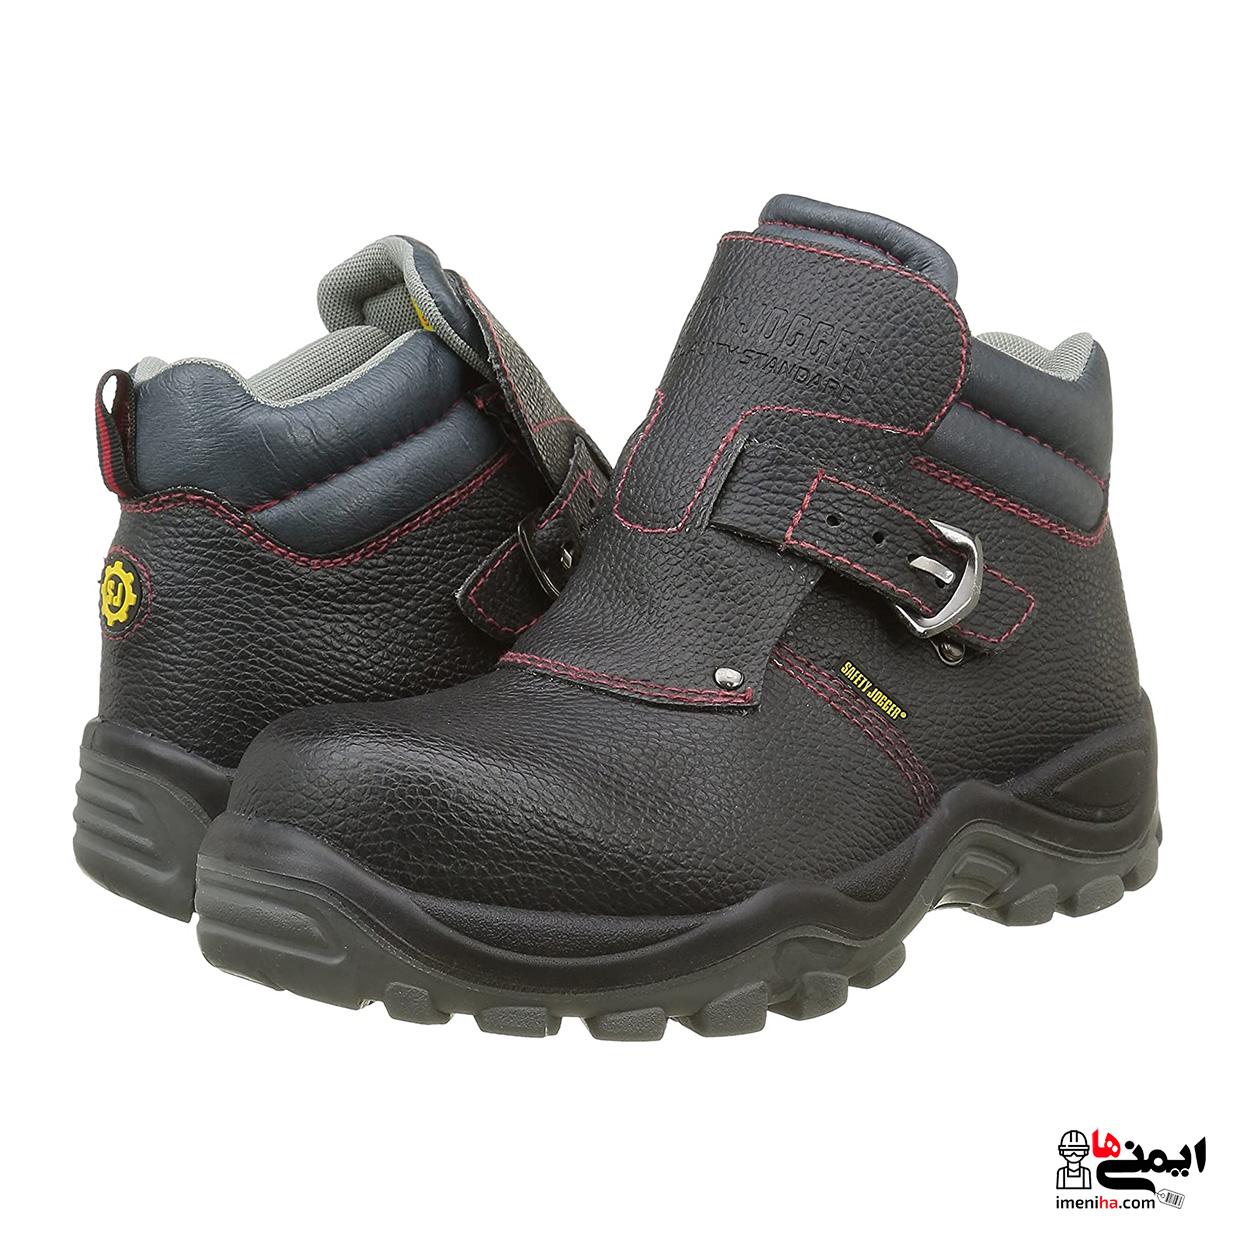 کفش کار خارجی - پوتین ایمنی